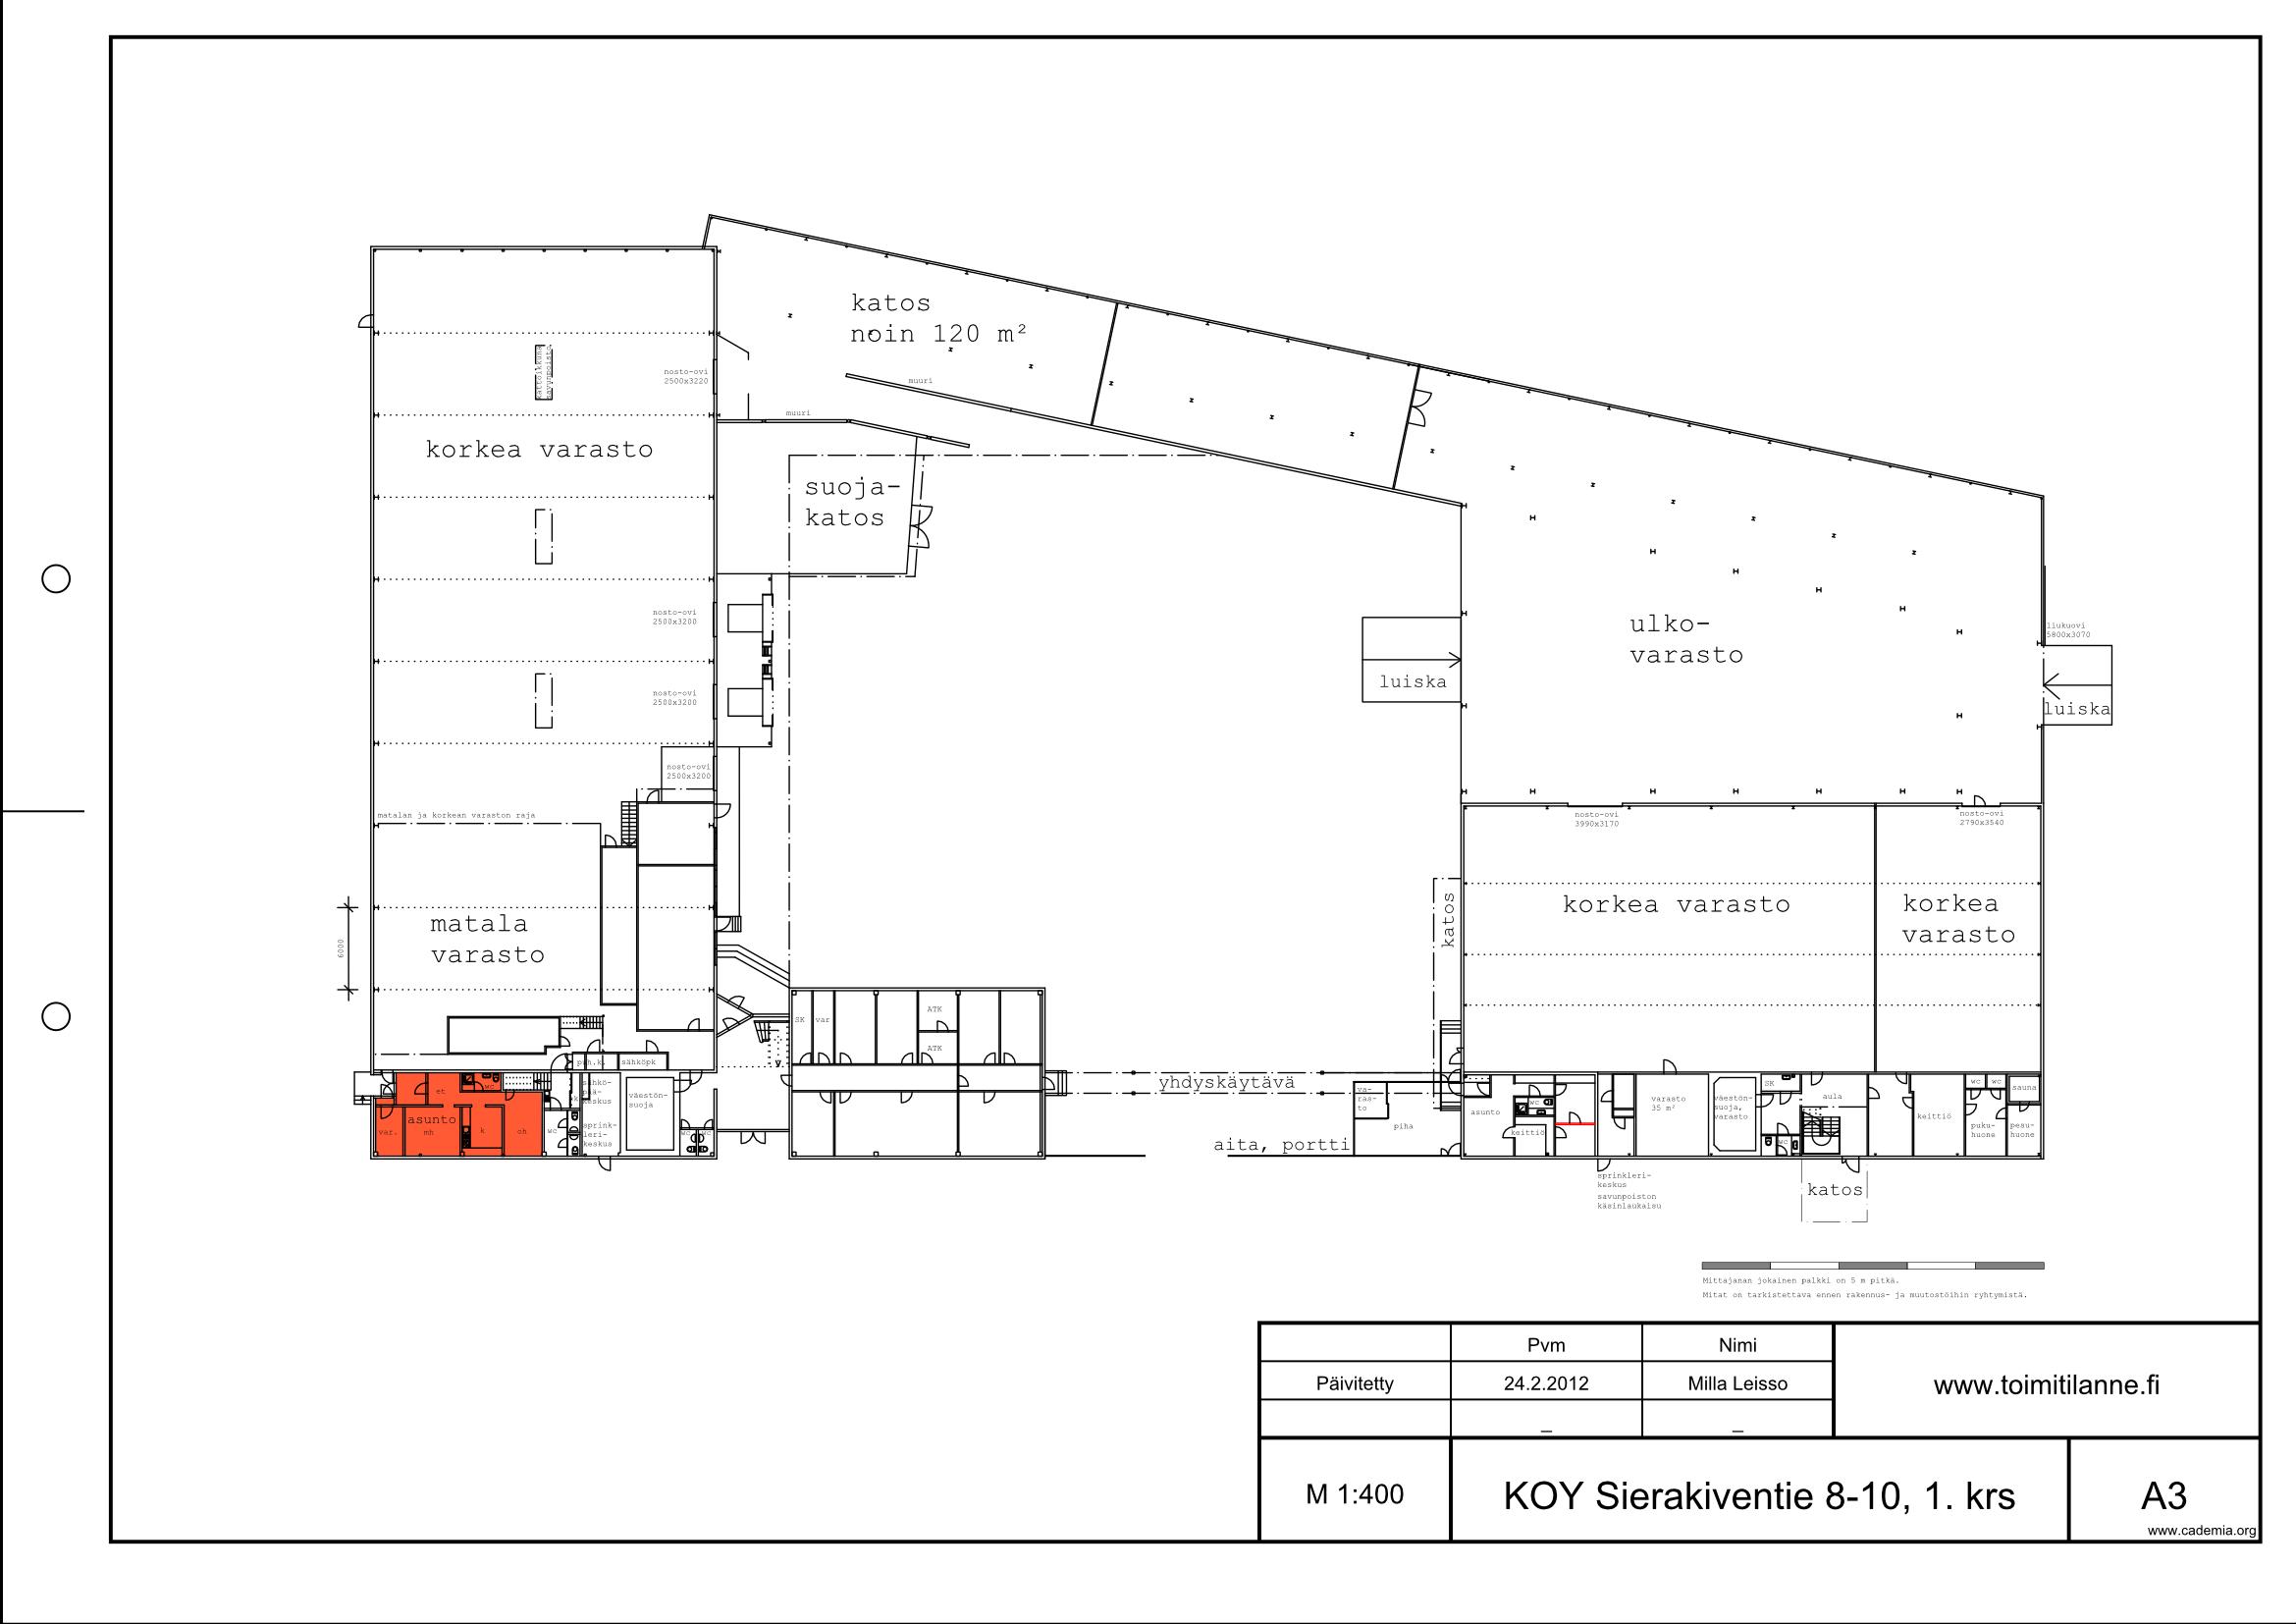 Toimitilanne Suomi, Espoo - Kauklahti, Sierakiventie 8-10, Asunto 67 m²